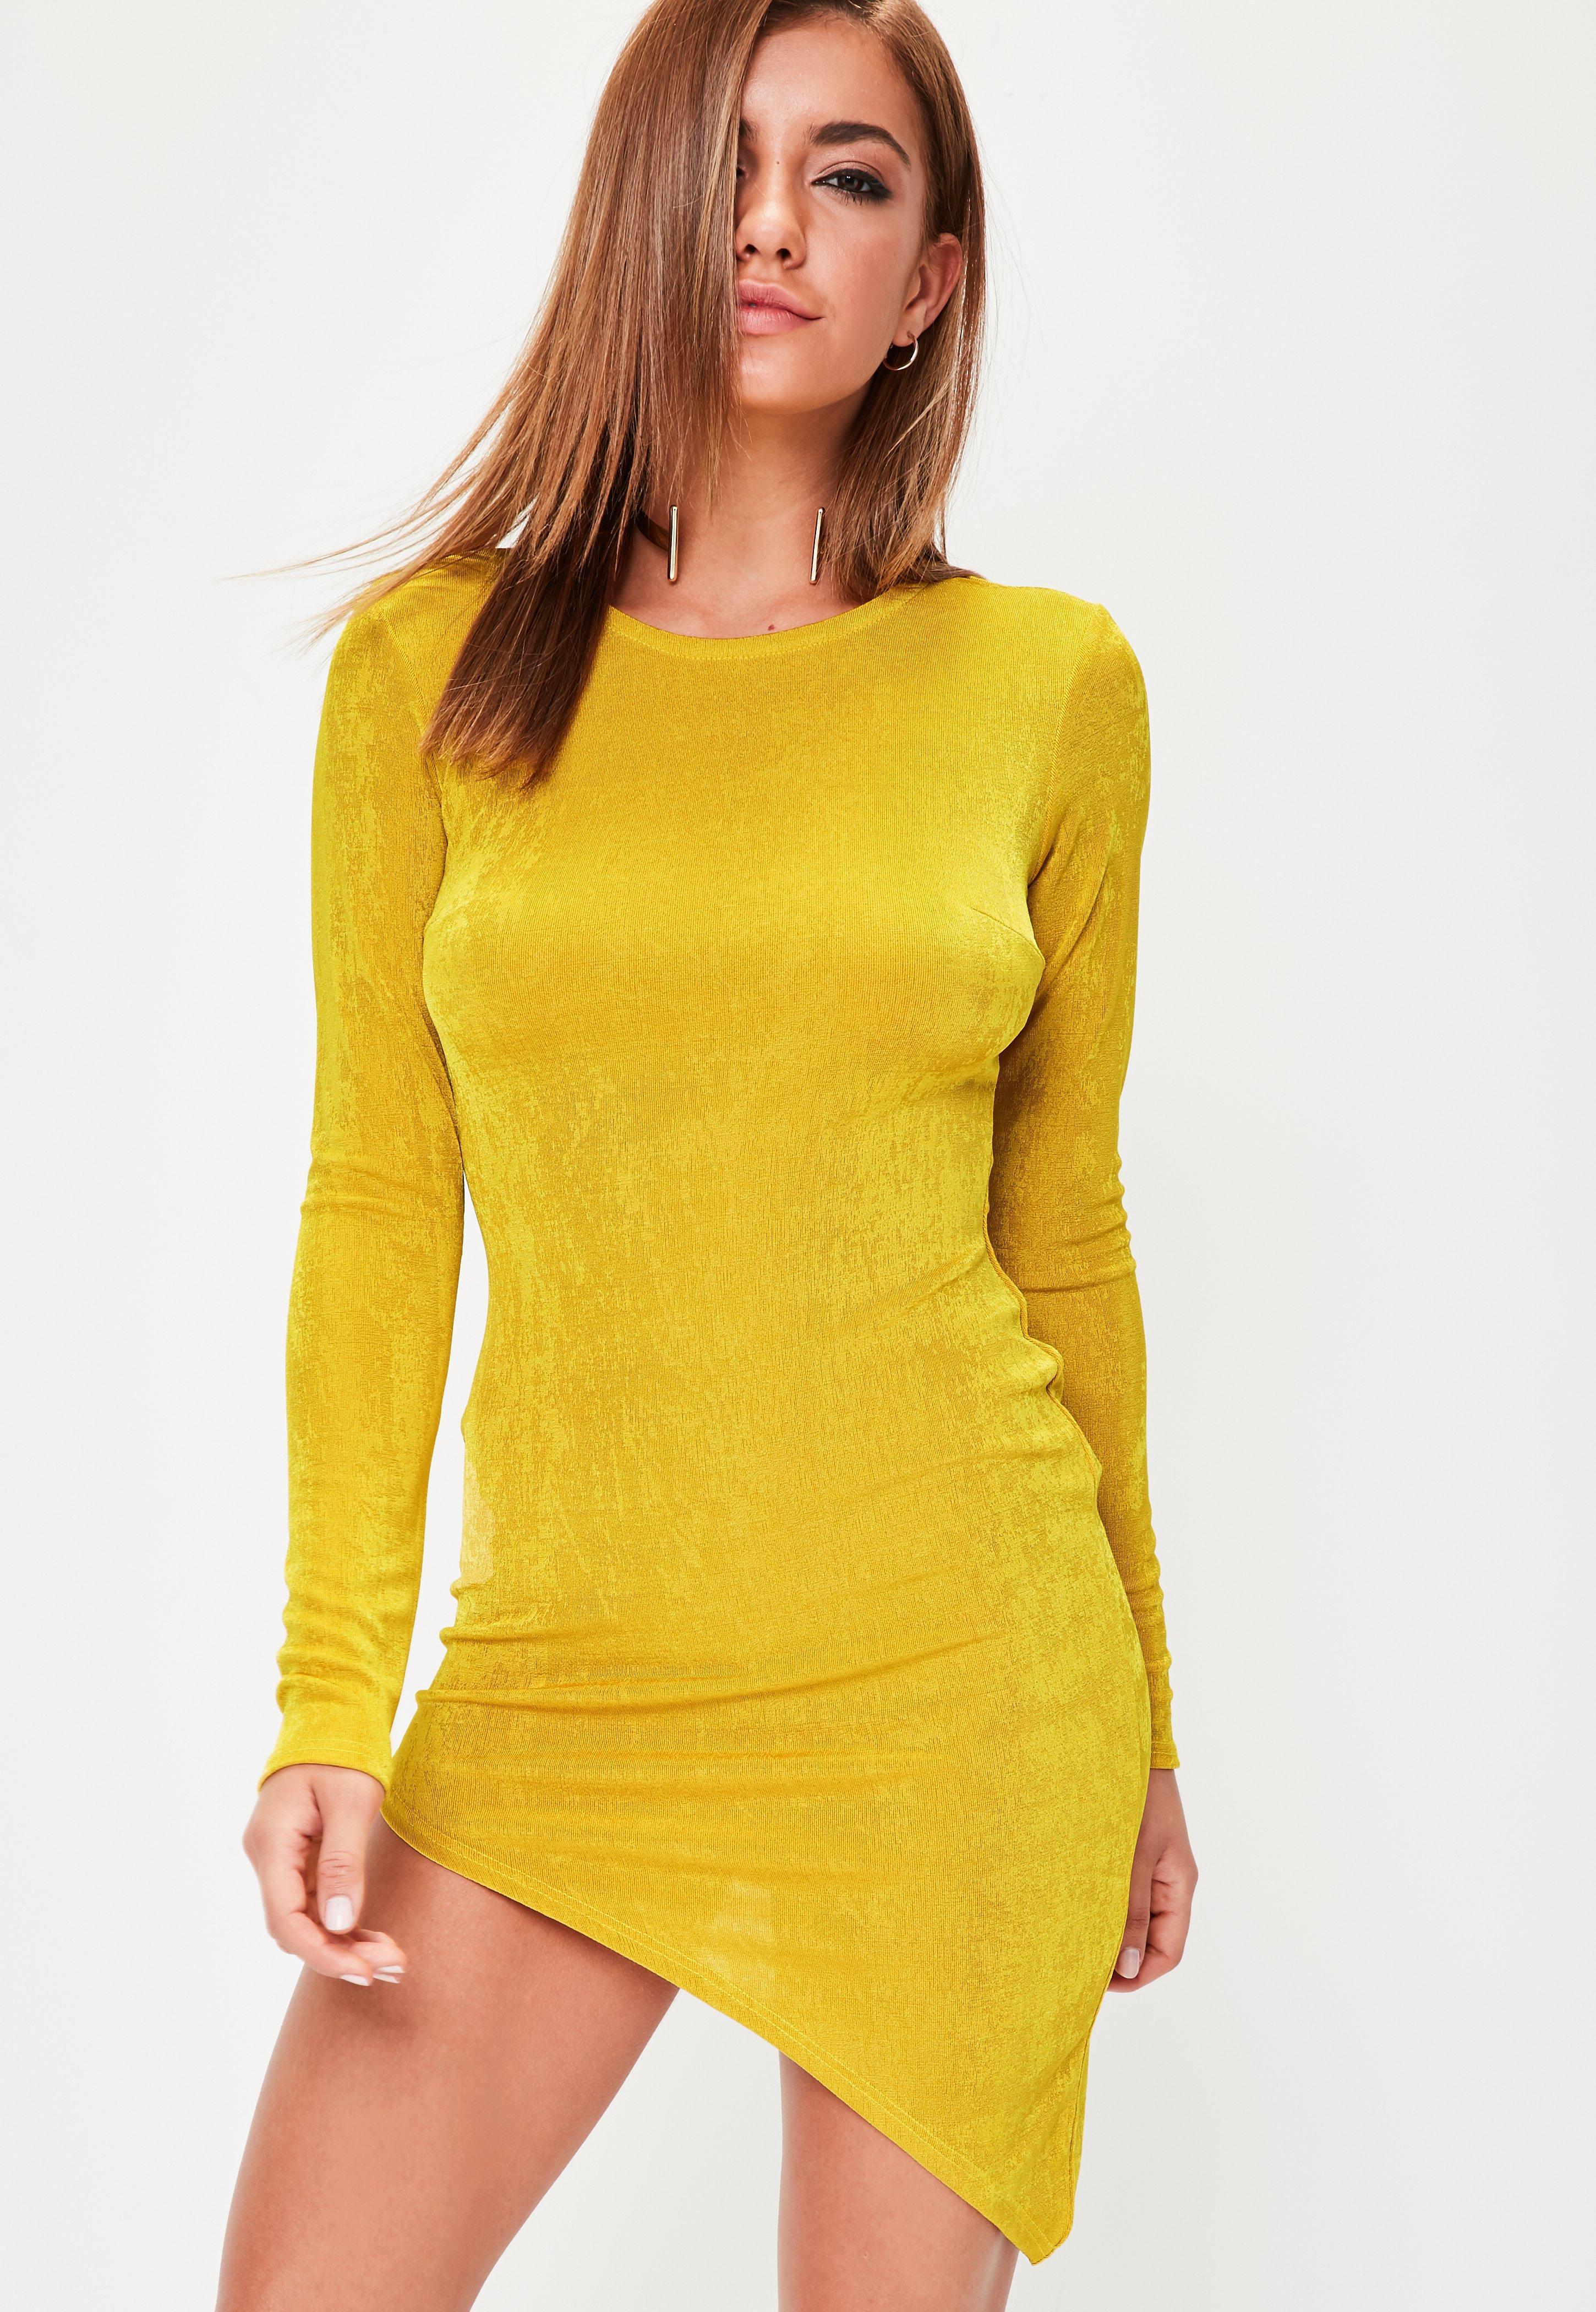 Yellow bodycon dress uk